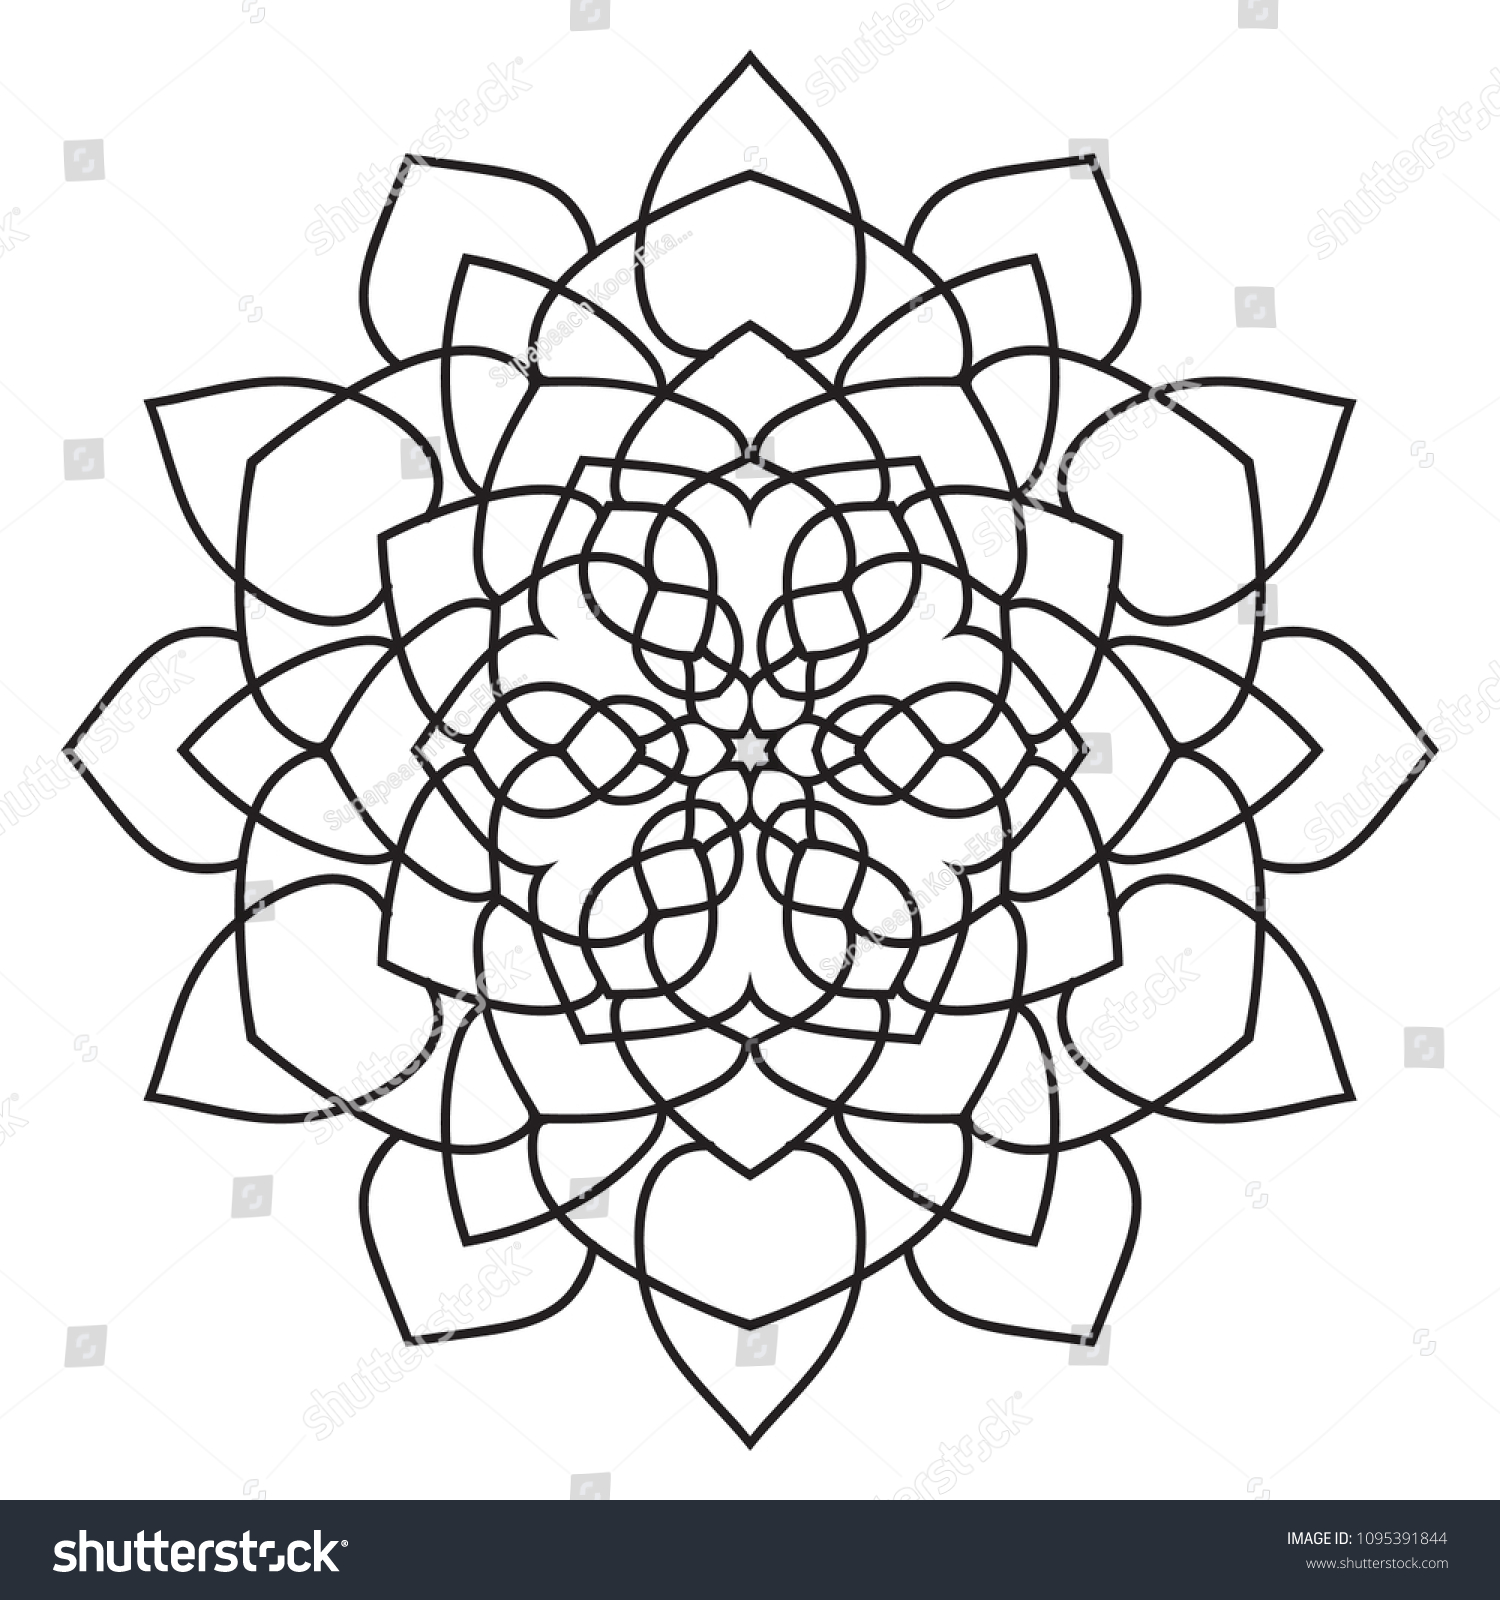 Easy Basic Mandala Coloring Book Pages Stockillustration 1095391844